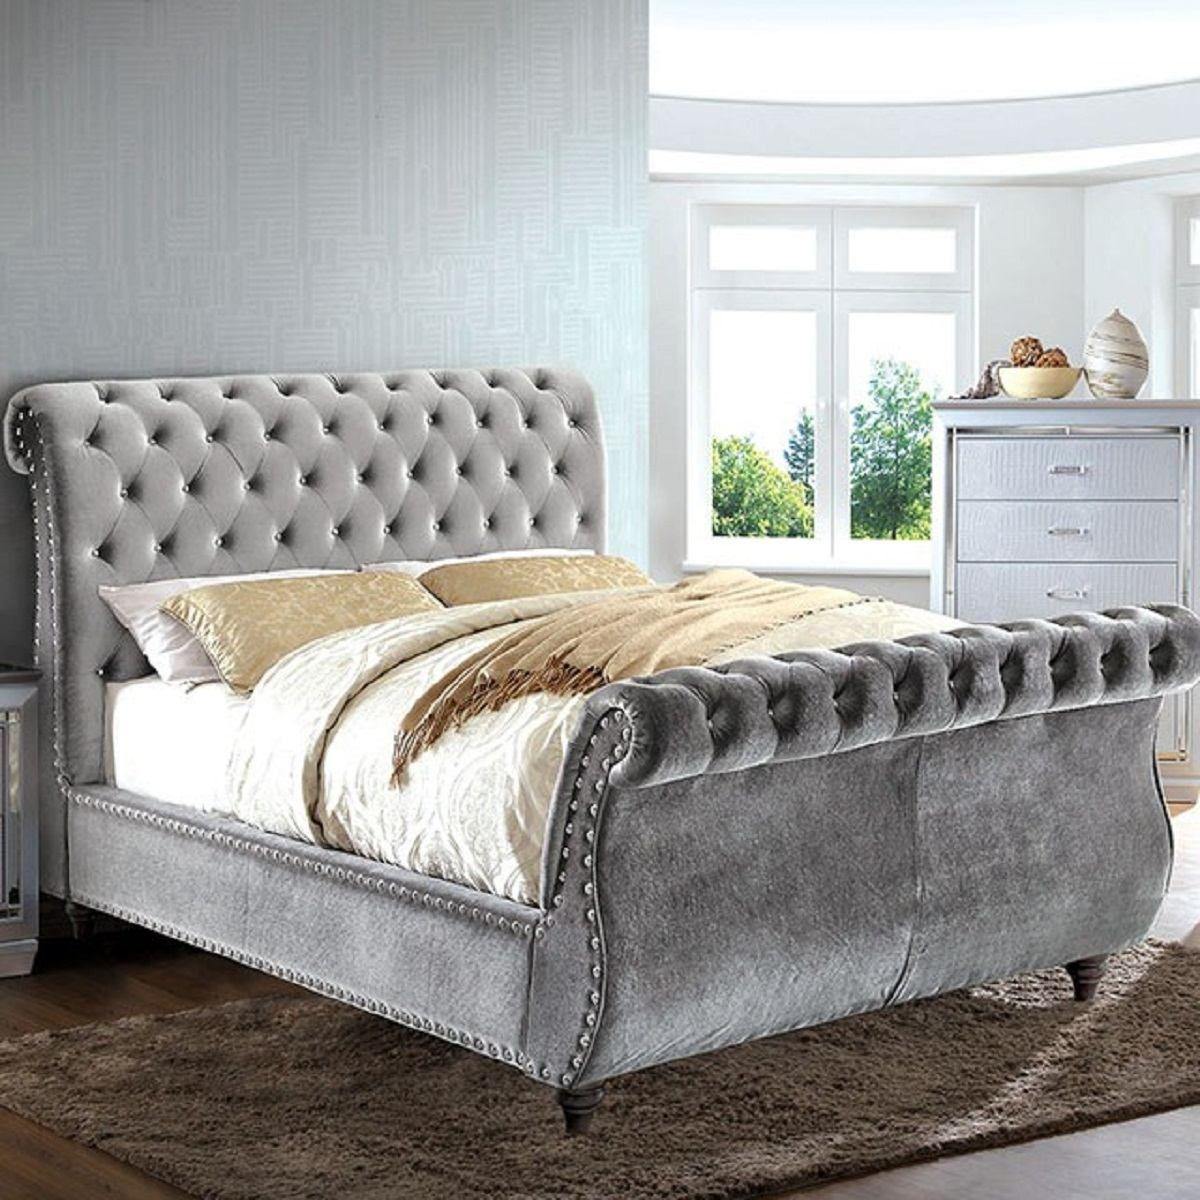 Furniture of America Noella California King Sleigh Bed in